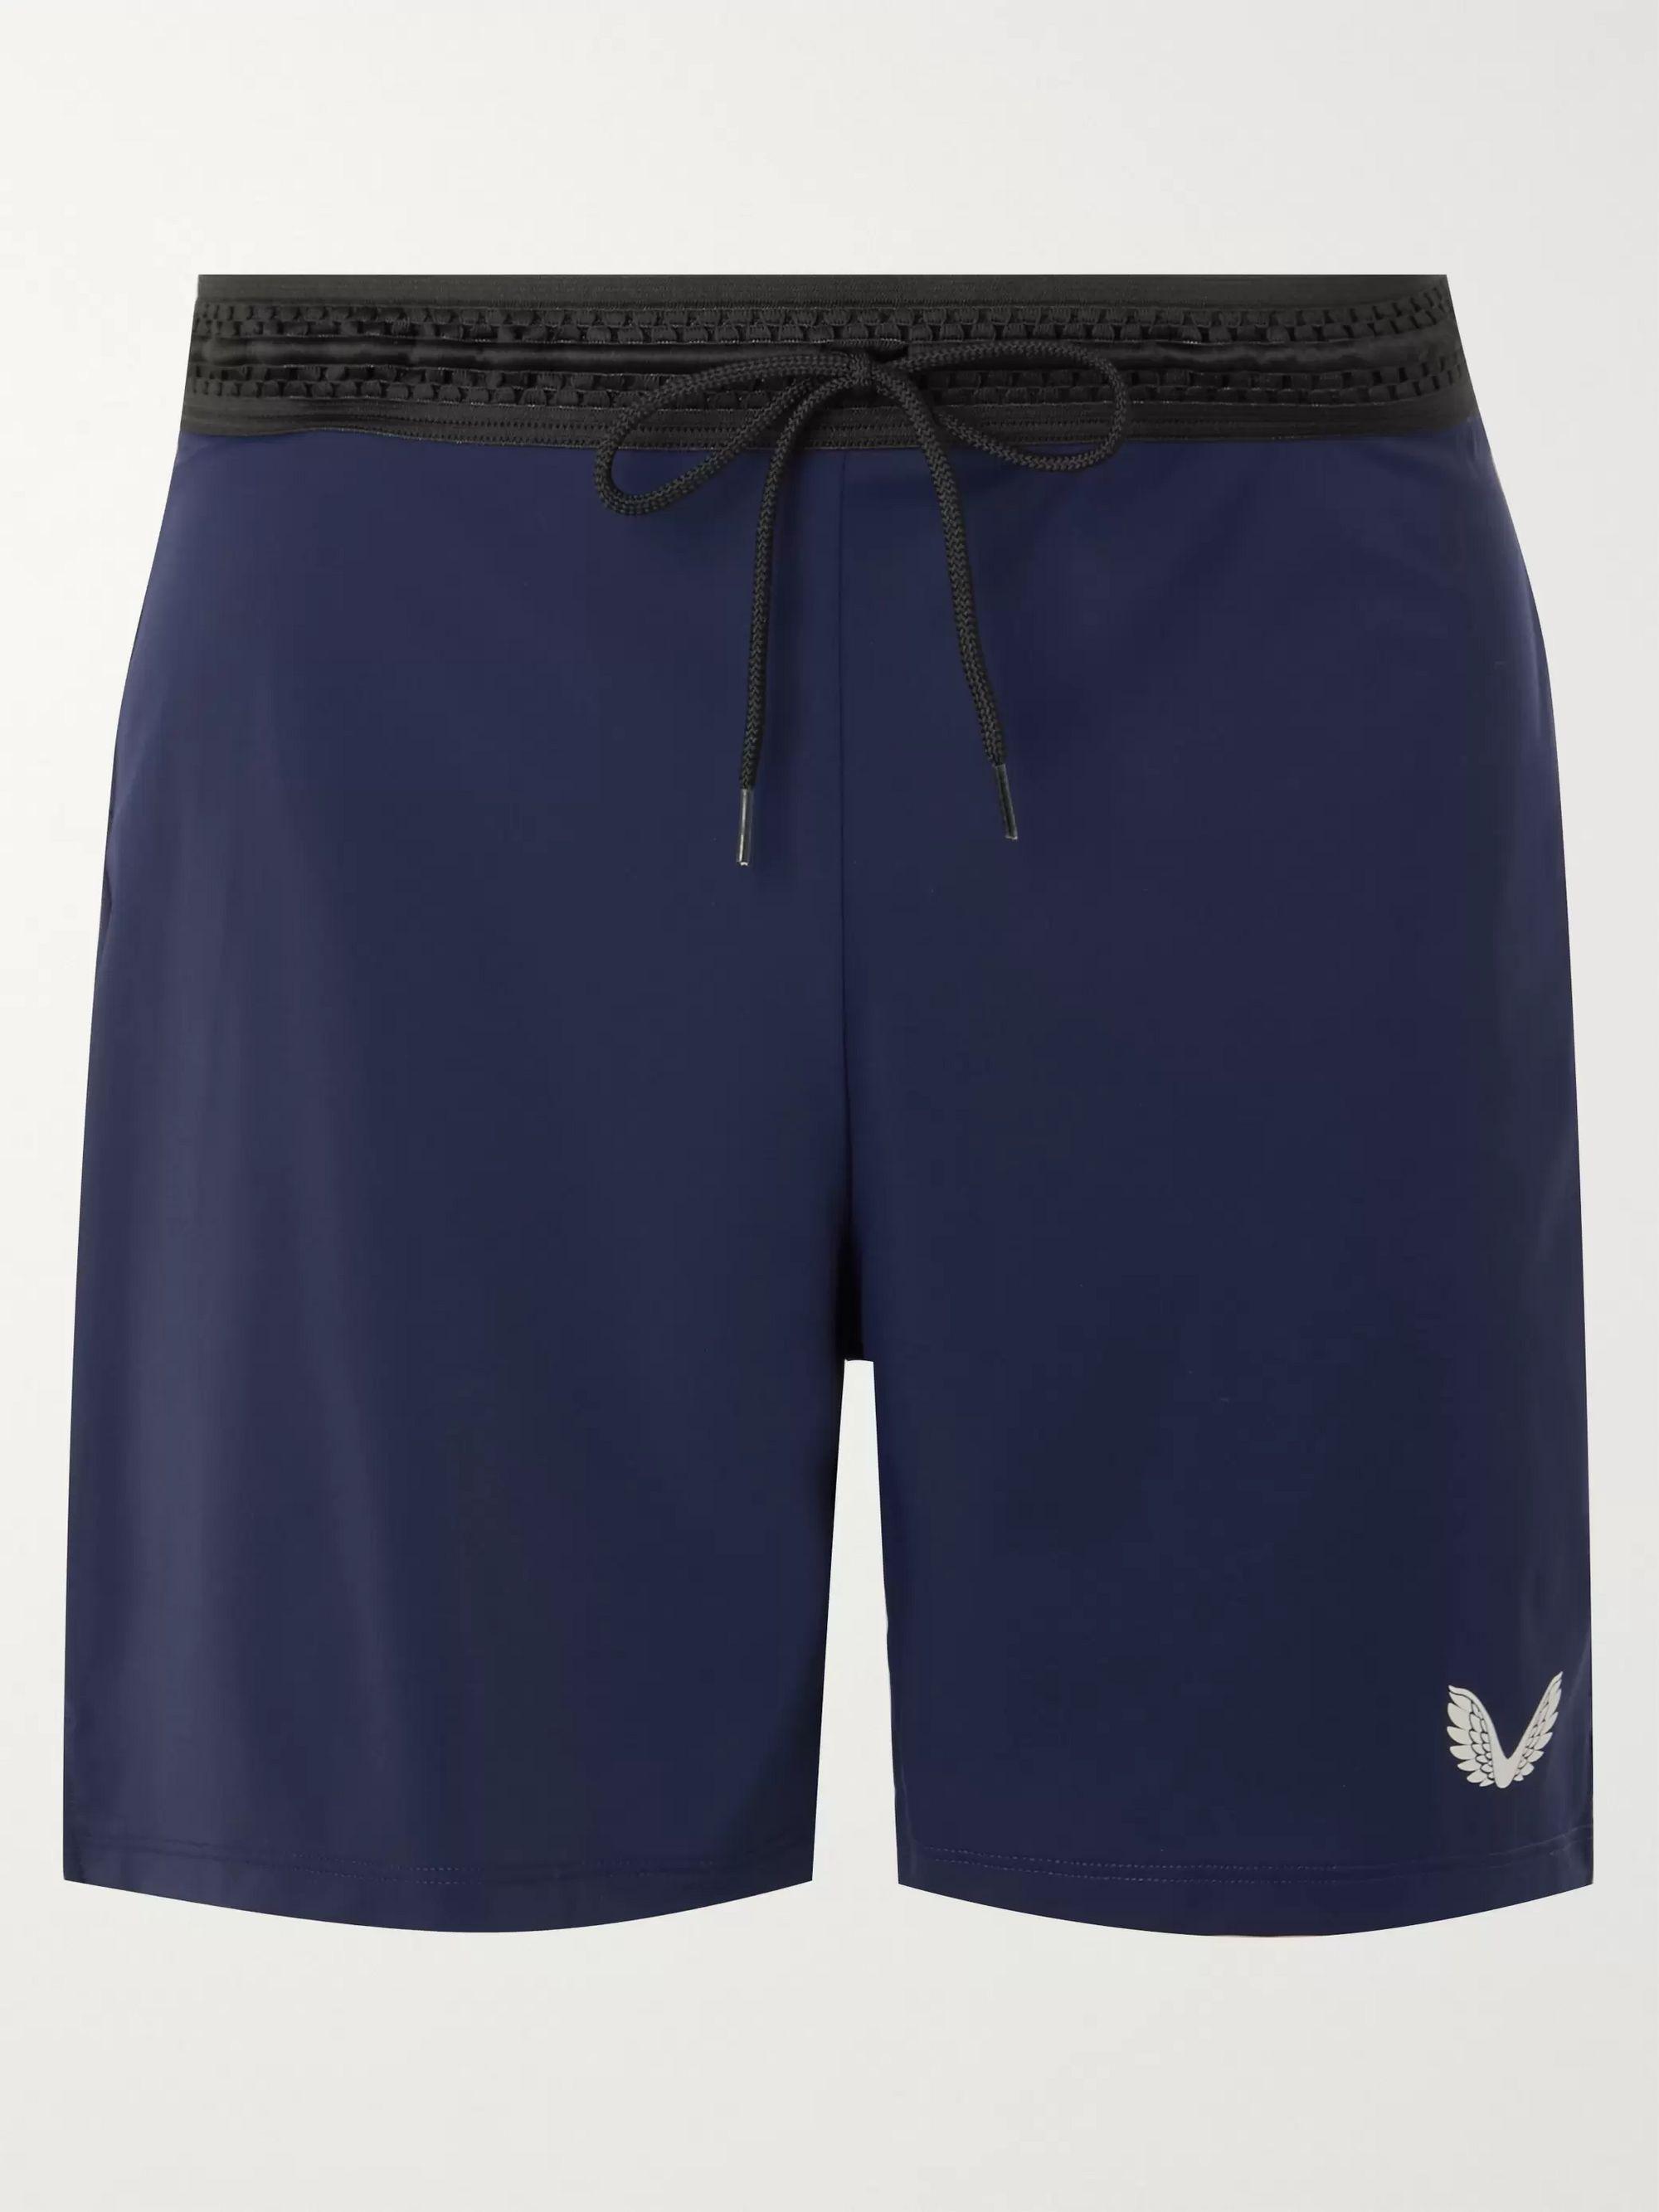 Navy Bowden Stretch-Shell Running Shorts | CASTORE | MR PORTER